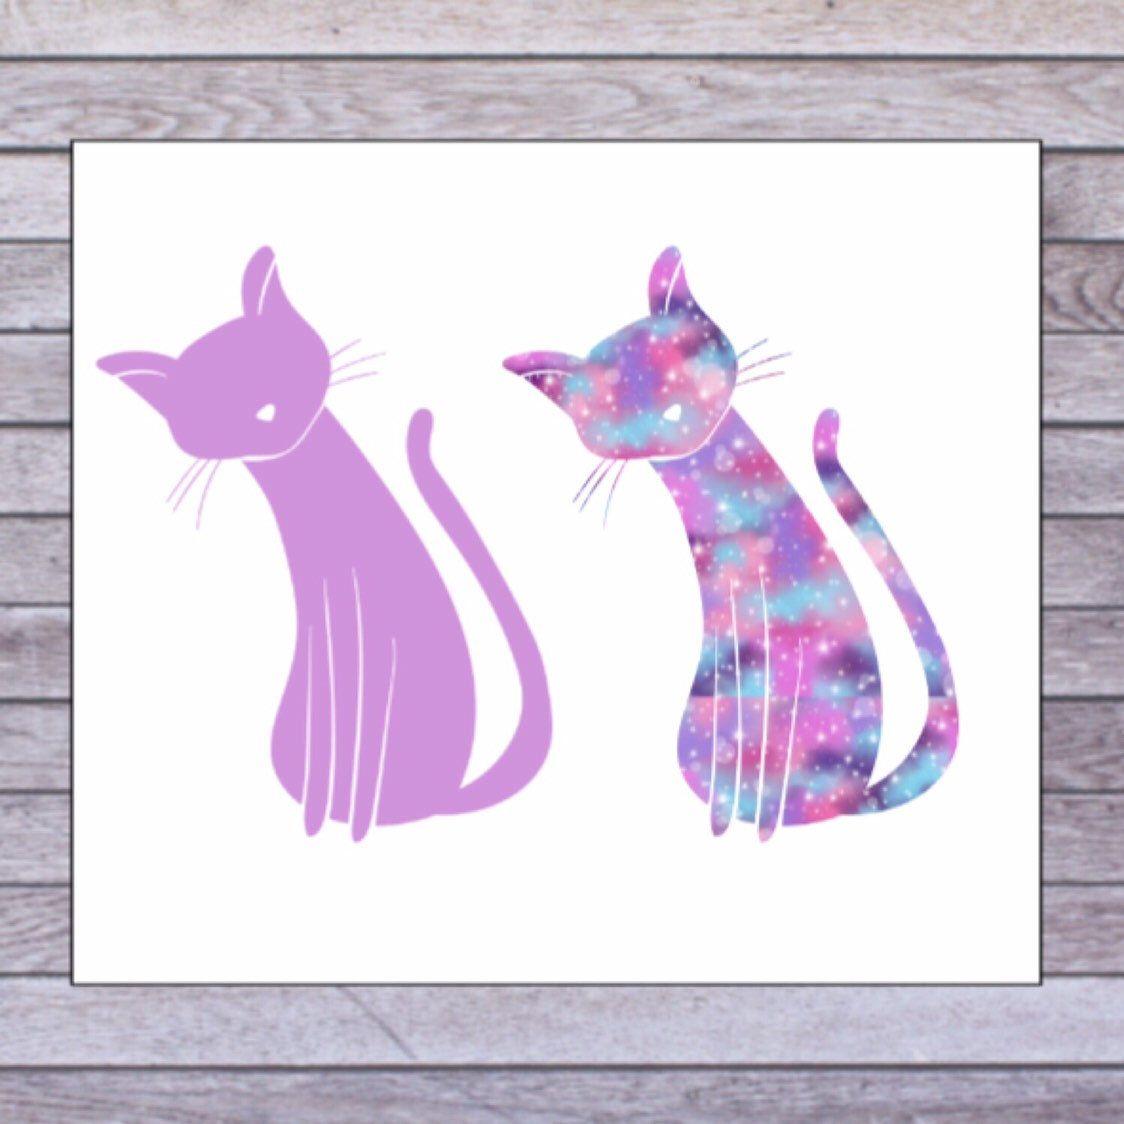 Cat Cup Decal Cat Decal For Tumbler Cat Car Decal Cat Etsy Cat Decal Cat Stickers Vinyl Decals